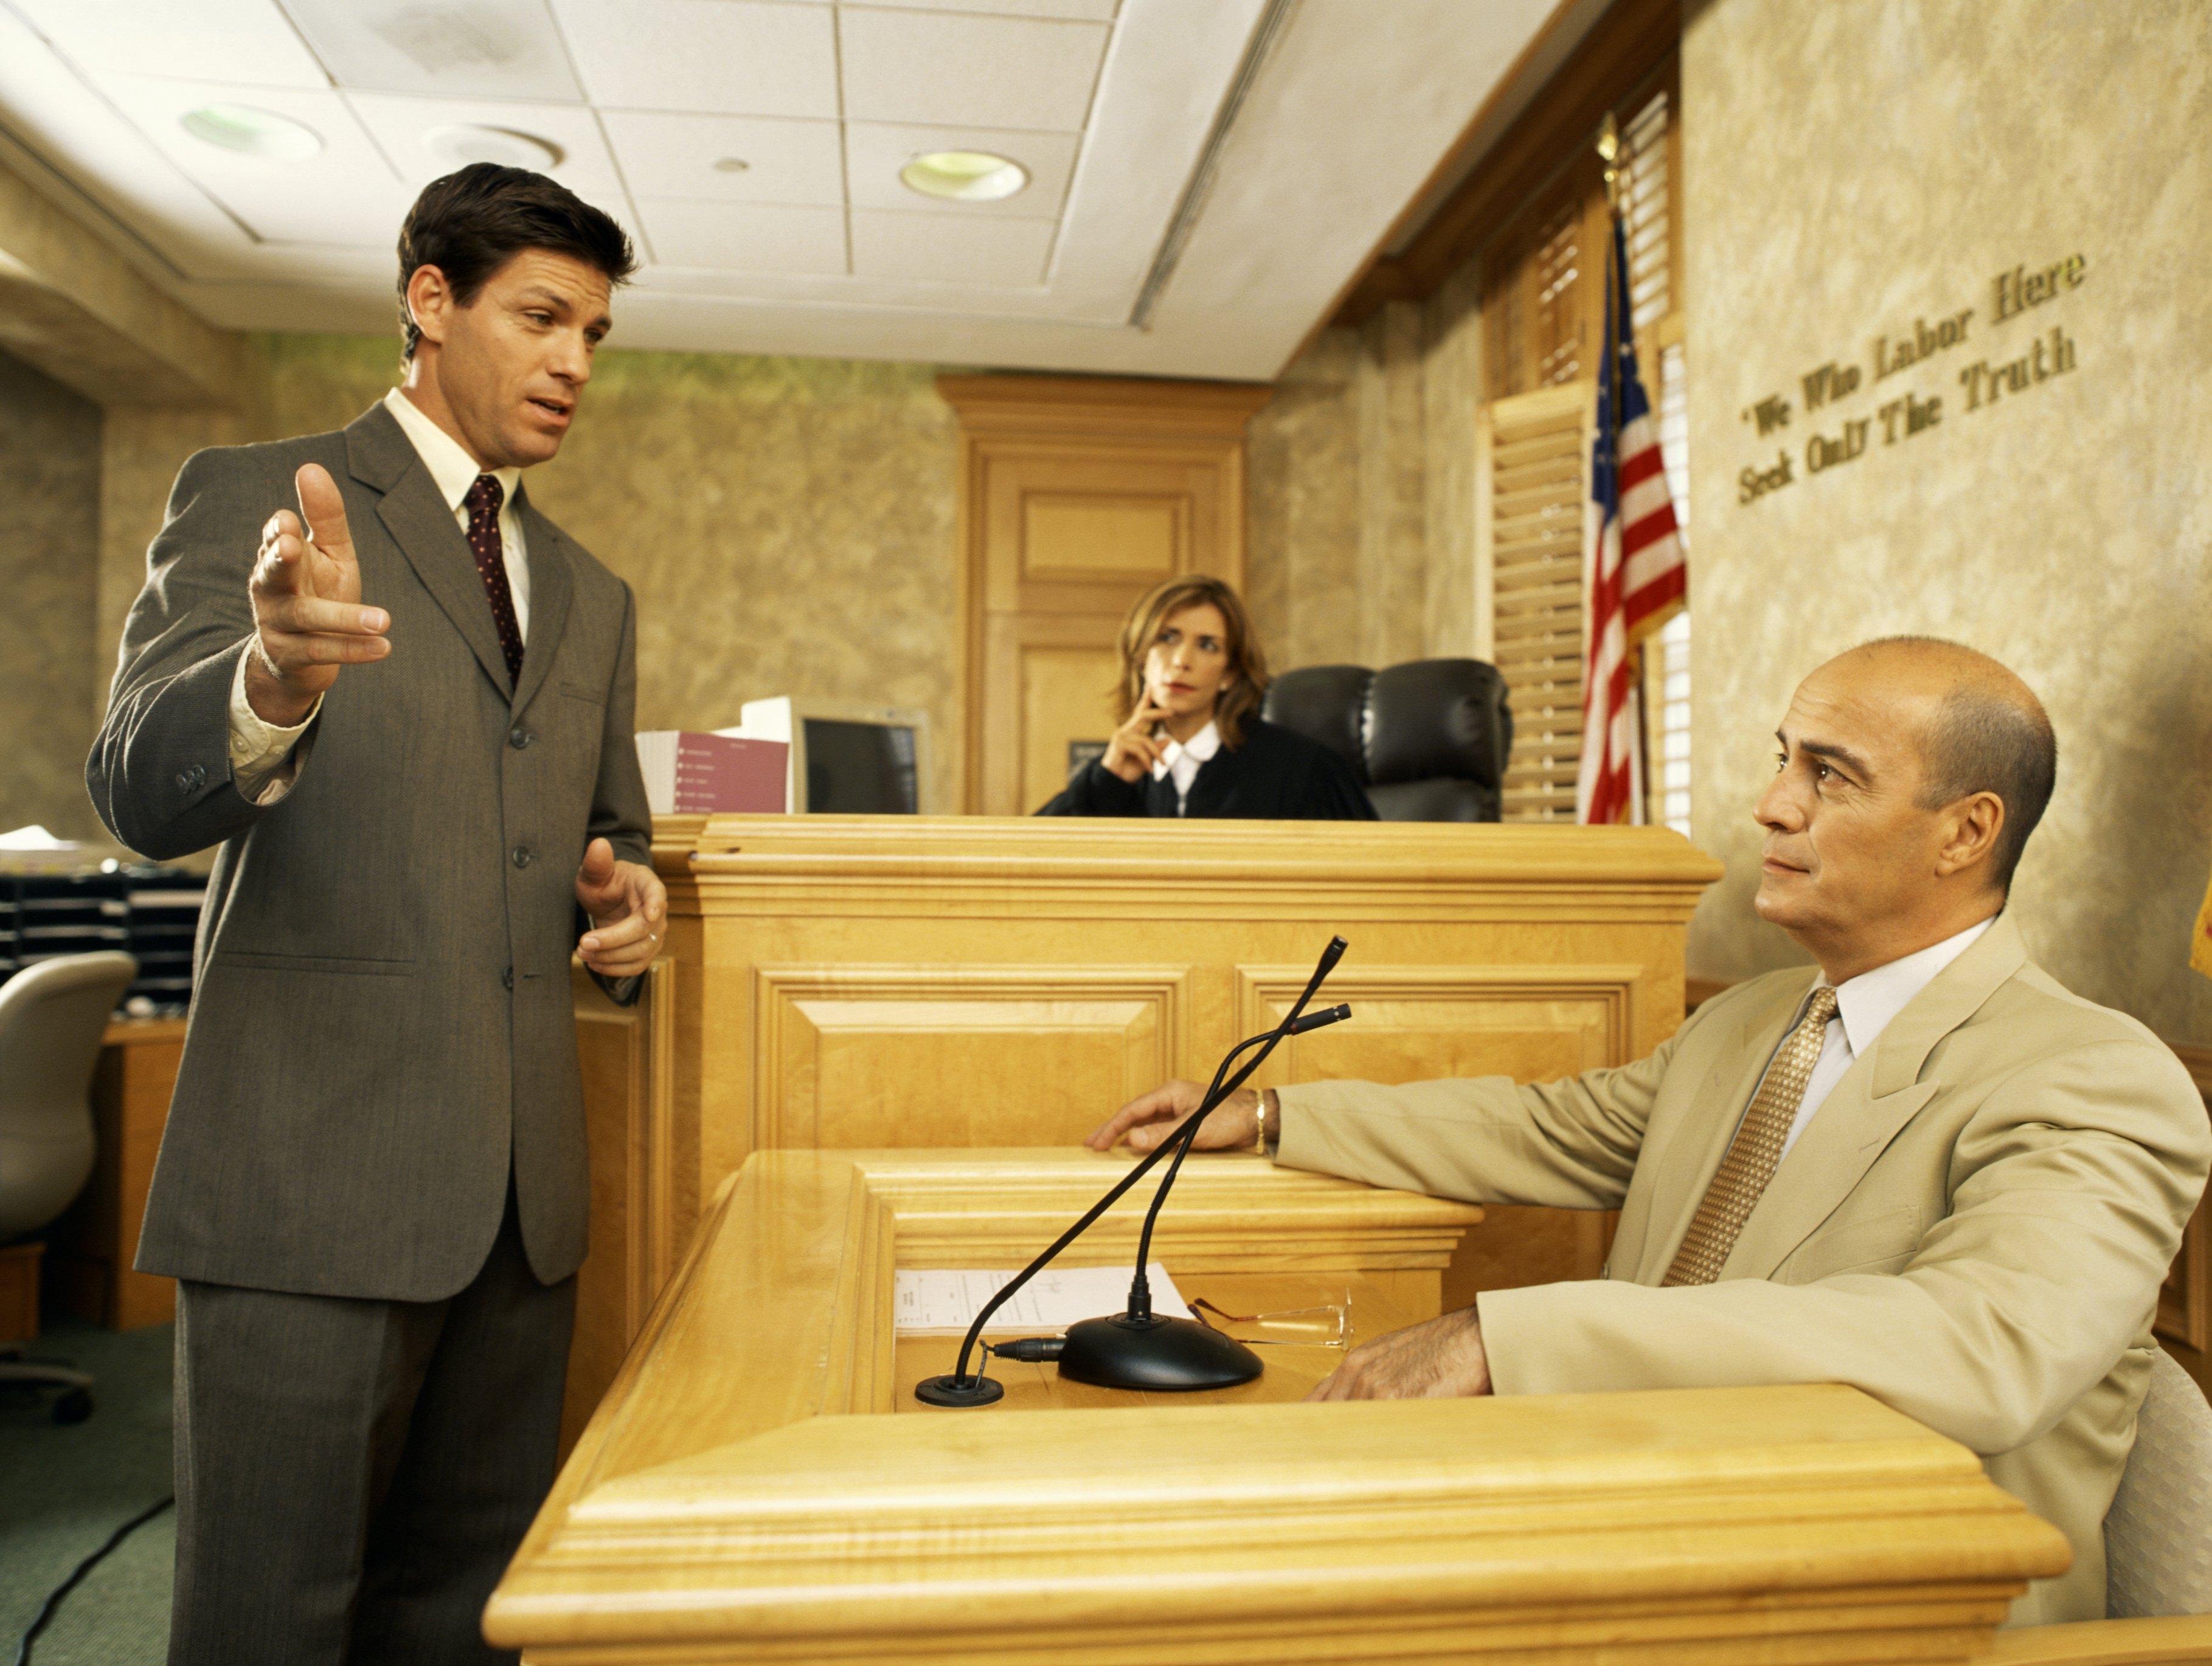 Employment Lawyer Free Advice